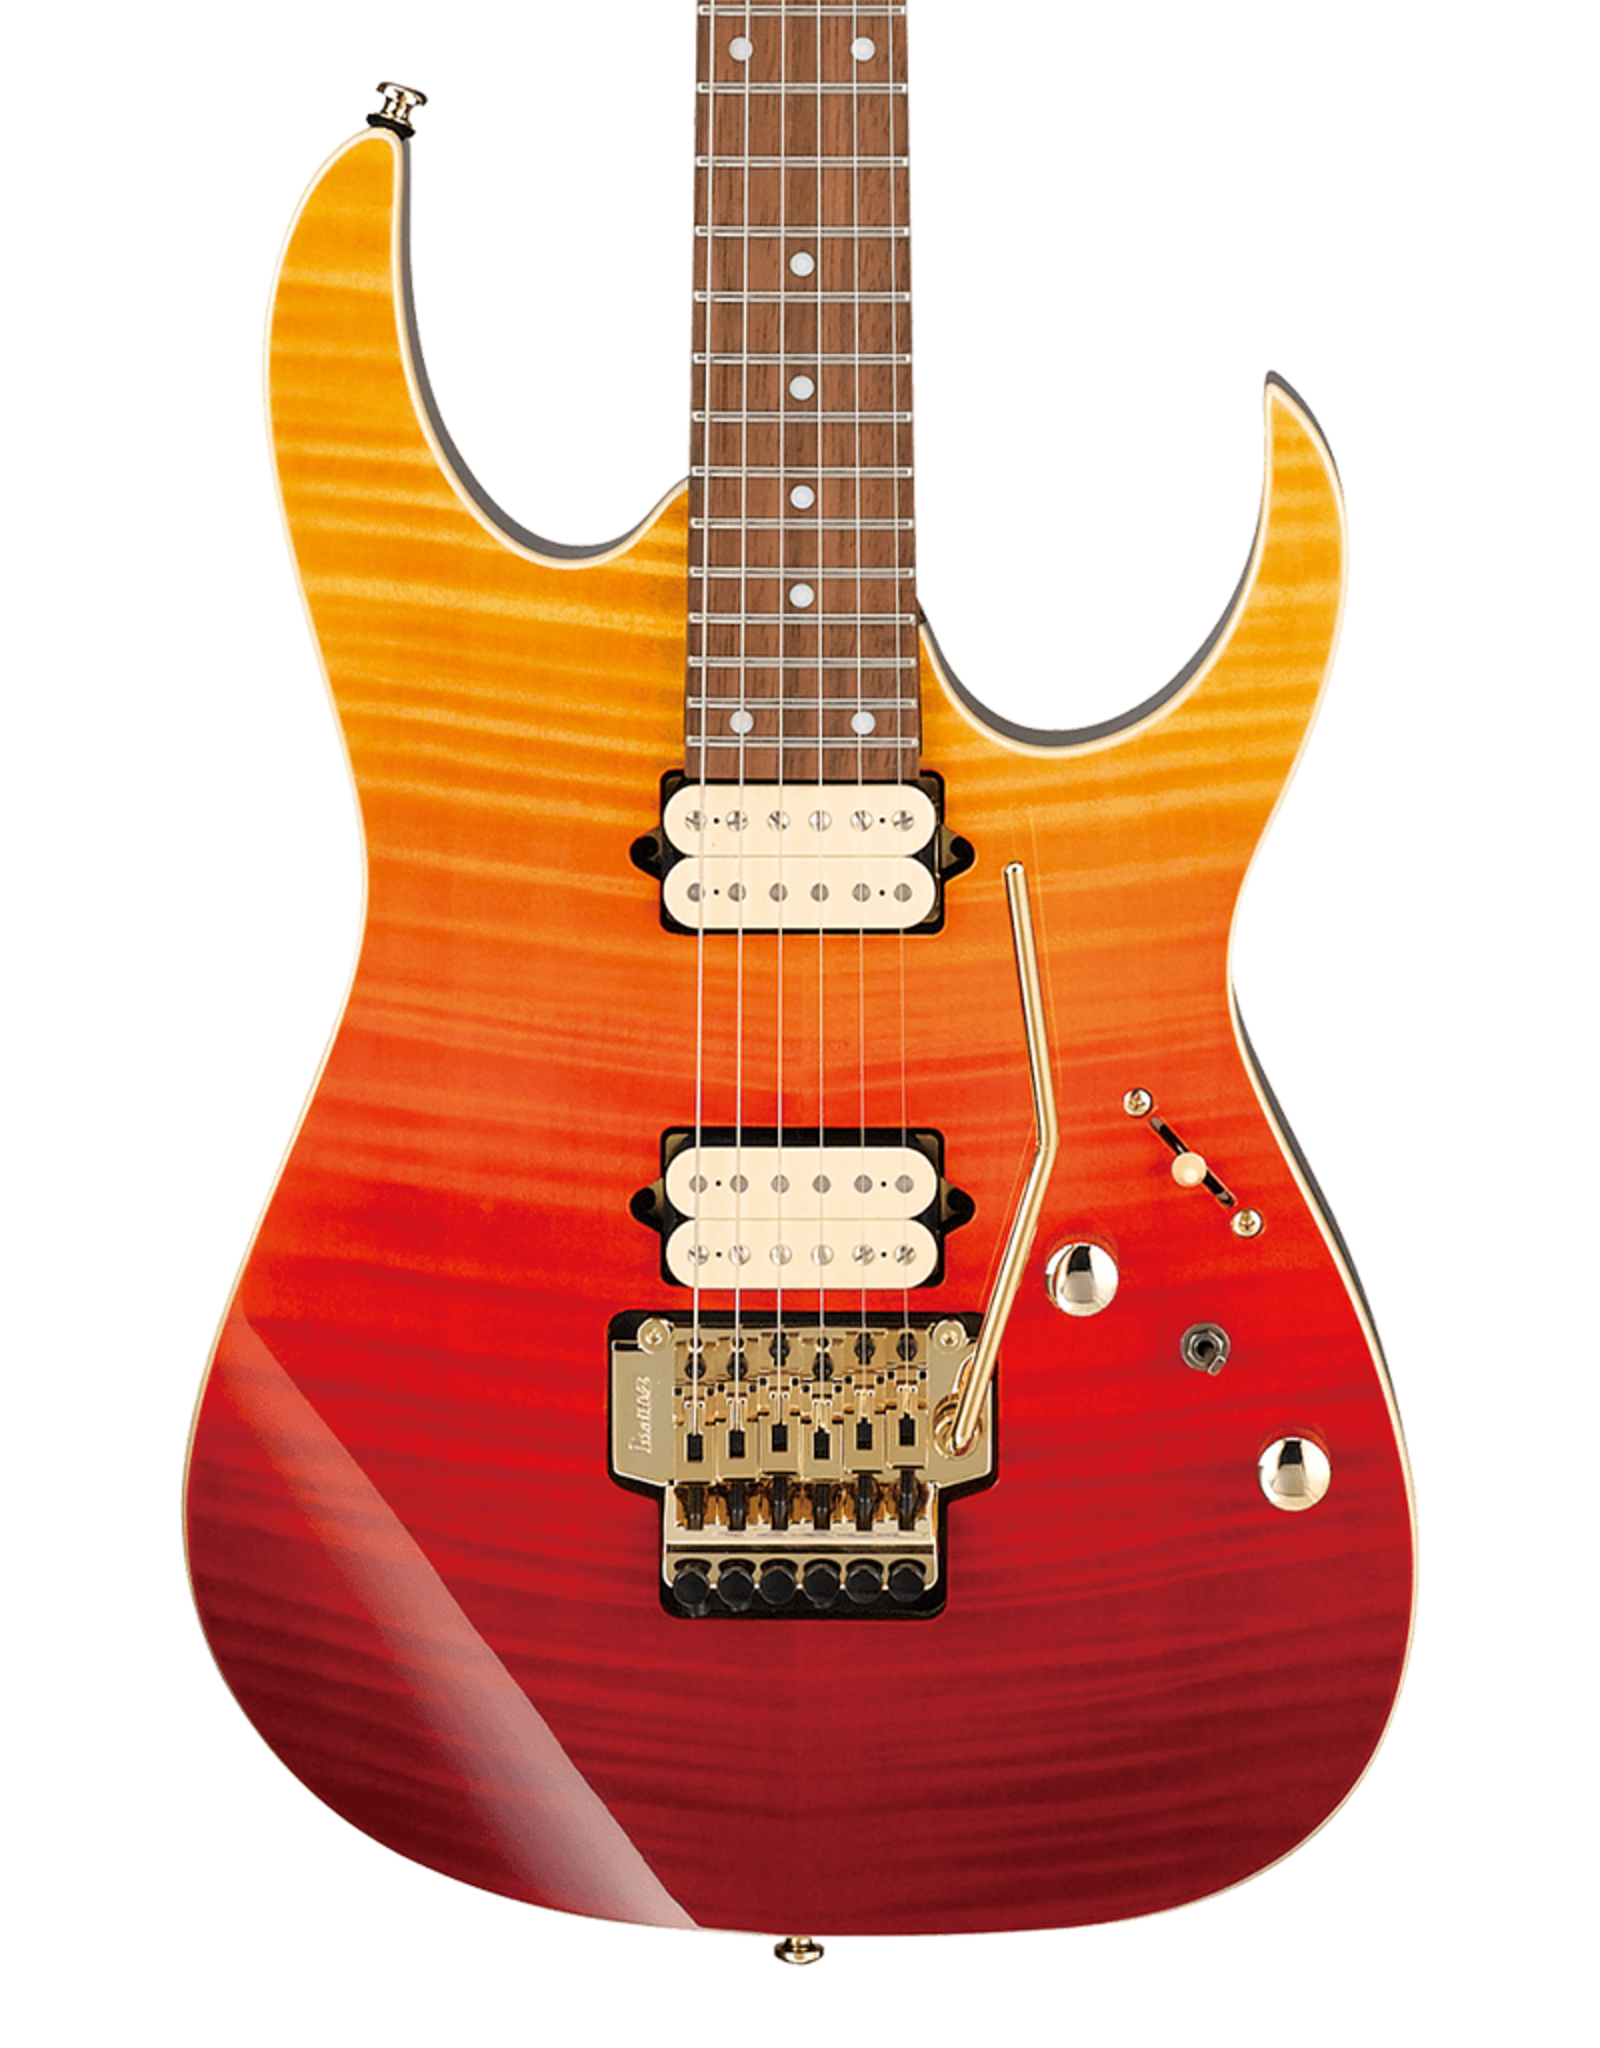 Ibanez RG420 Electric Autumn Leaf Guitar